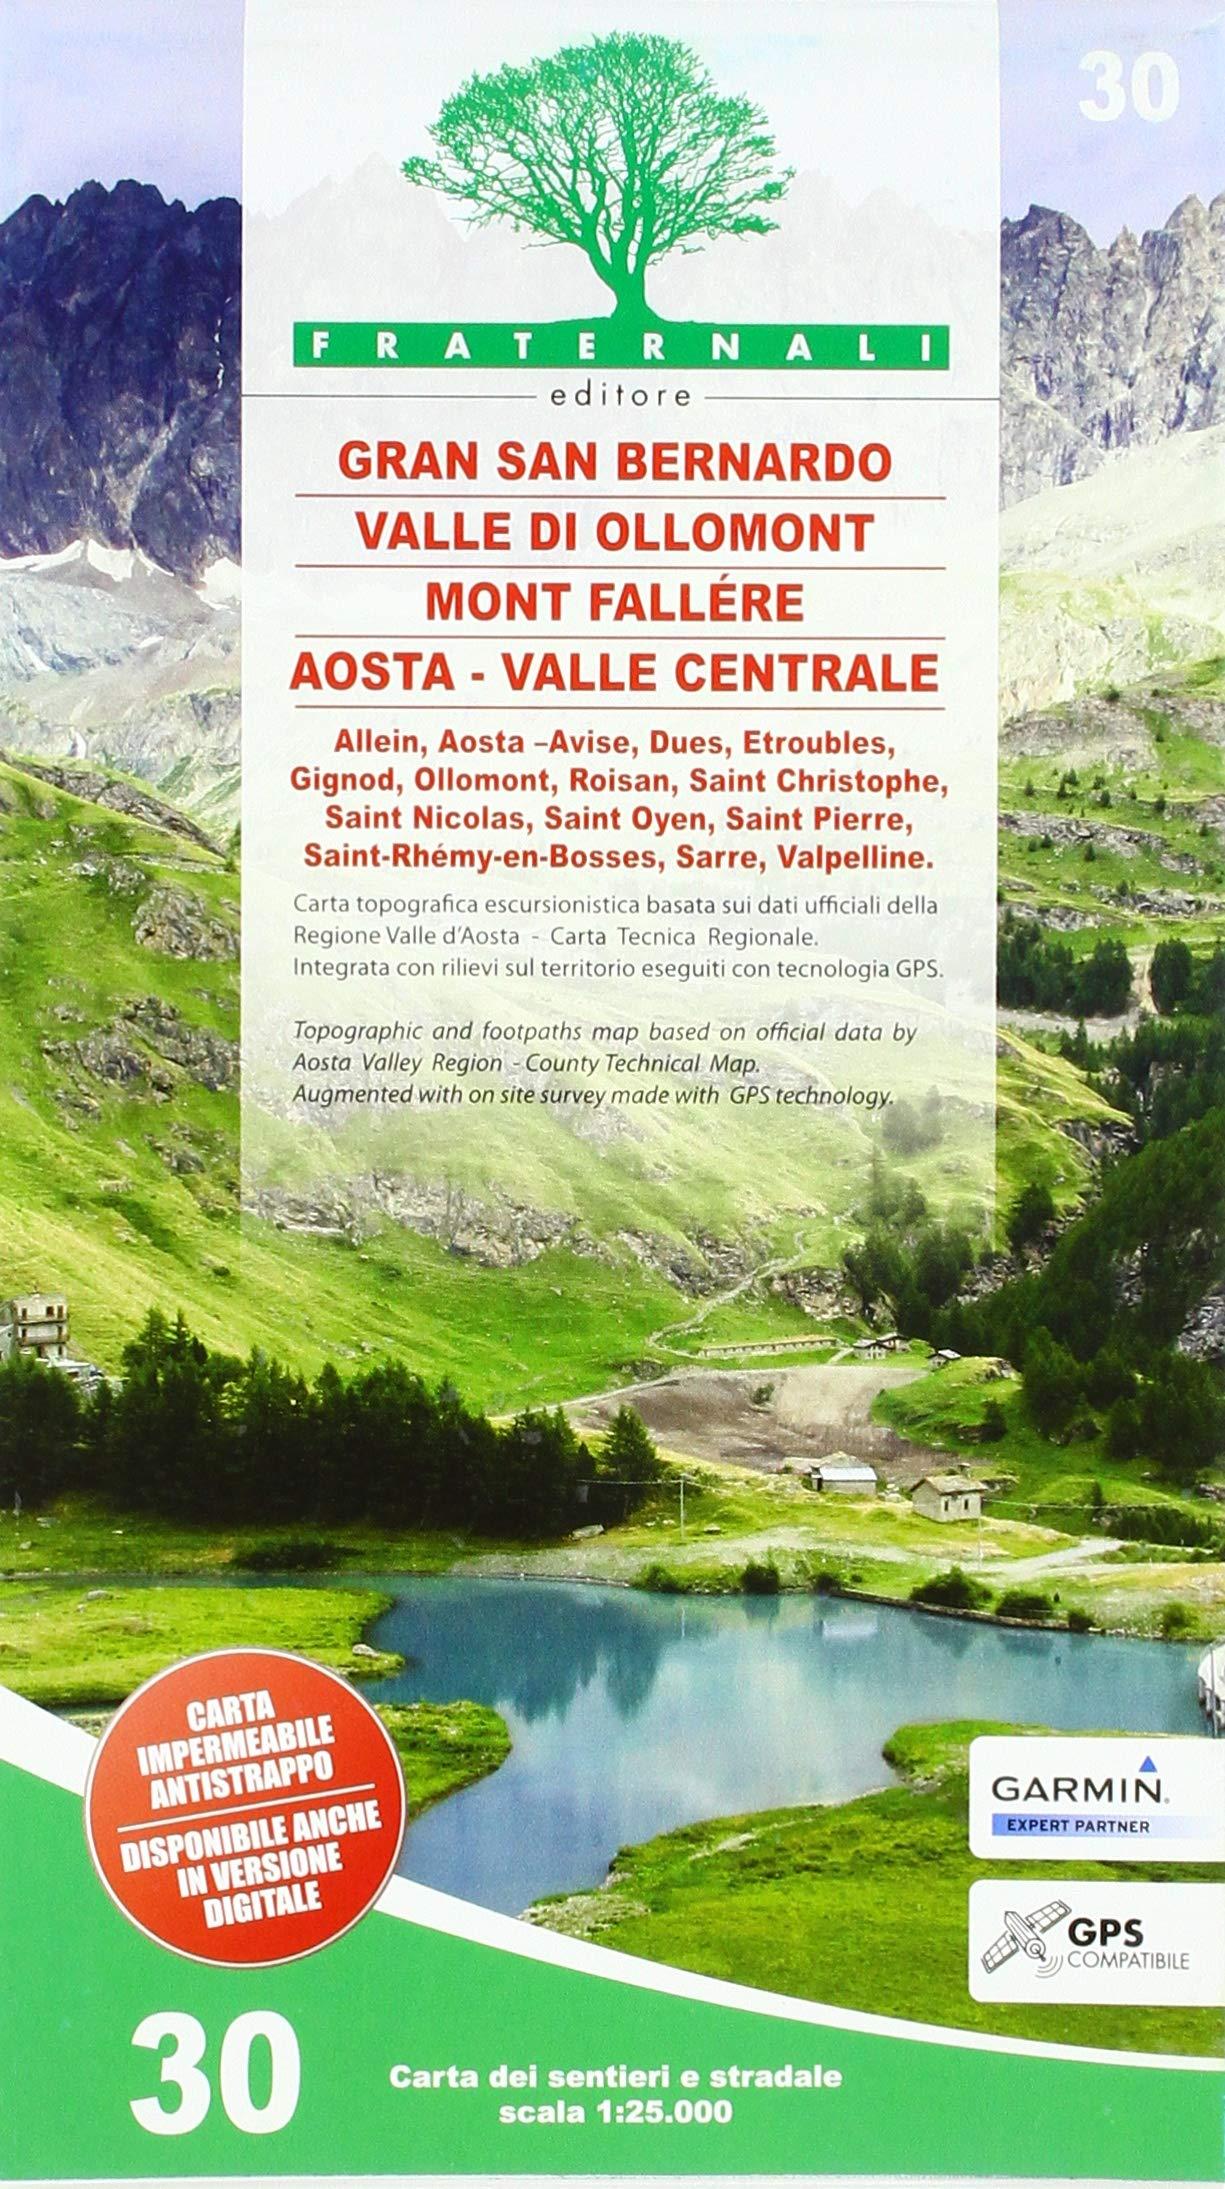 FRA-30 Gran San Bernardo - Valle di Ollomont-  Mont Fallére - Aosta | wandelkaart 1:25.000 9788897465478  Fraternali Editore   Wandelkaarten Aosta, Gran Paradiso